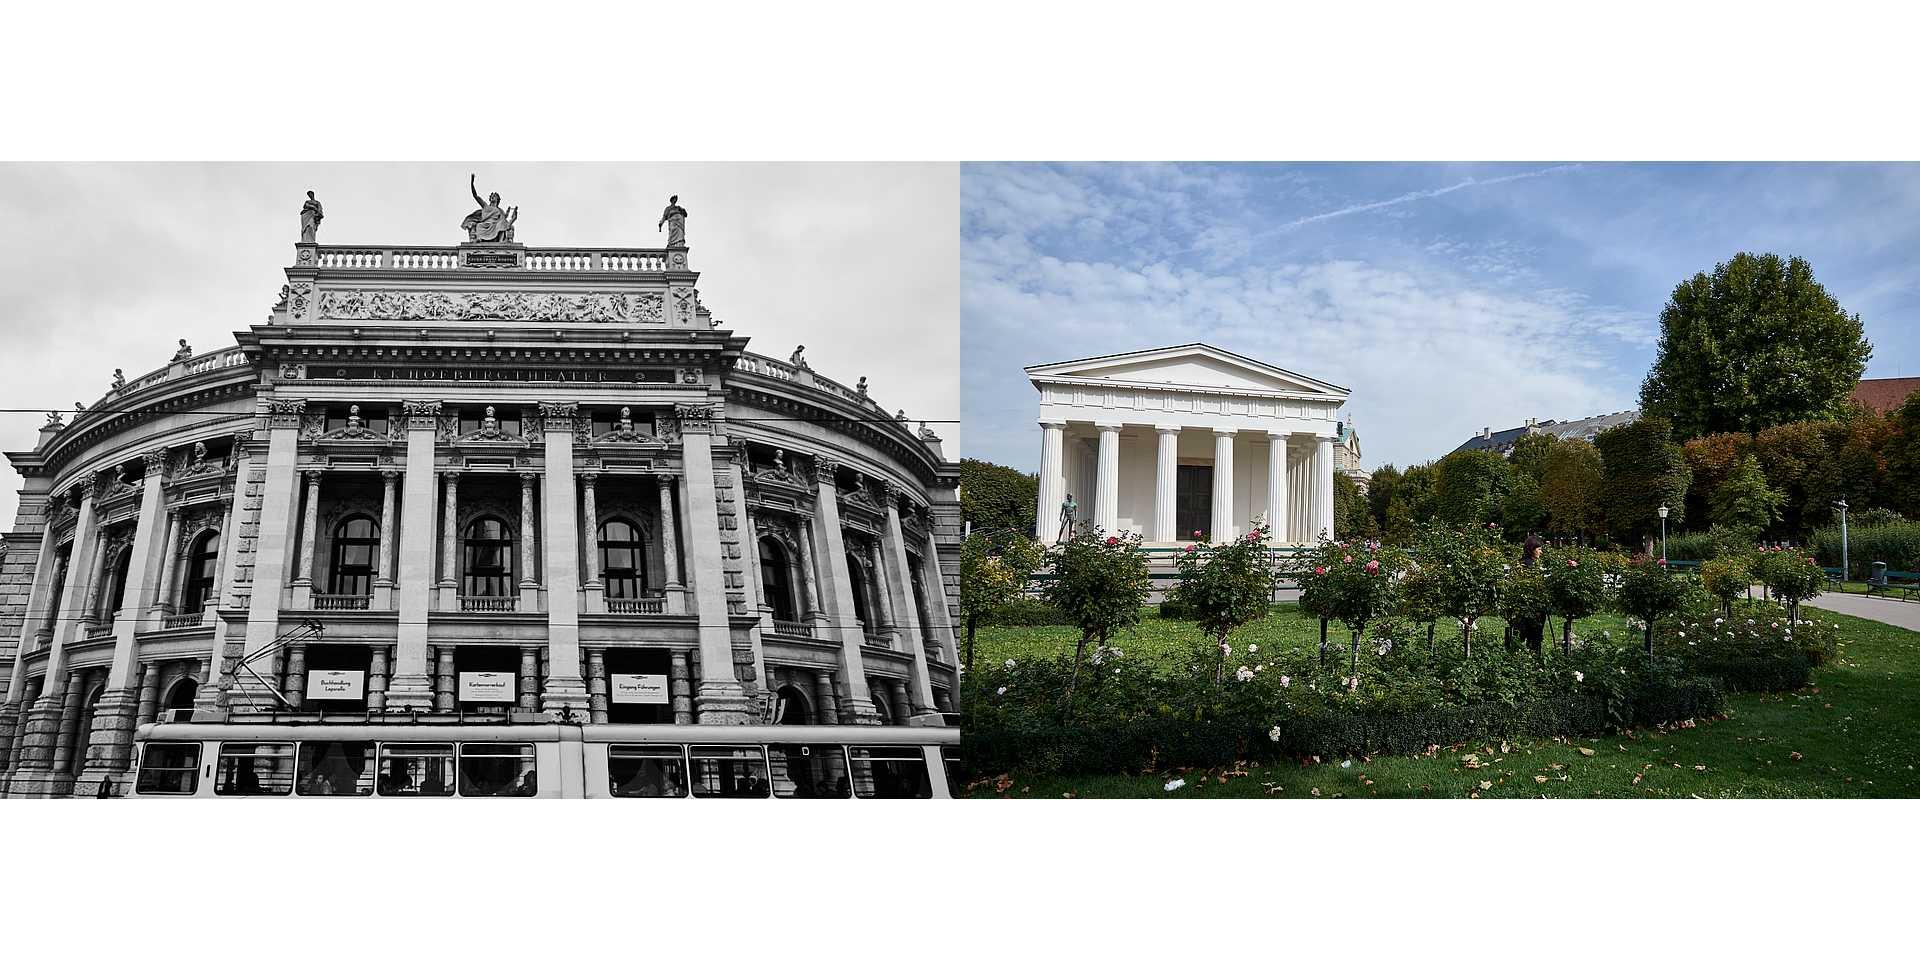 Live your Life - Descubre Viena - Ringstrasse - Teatro